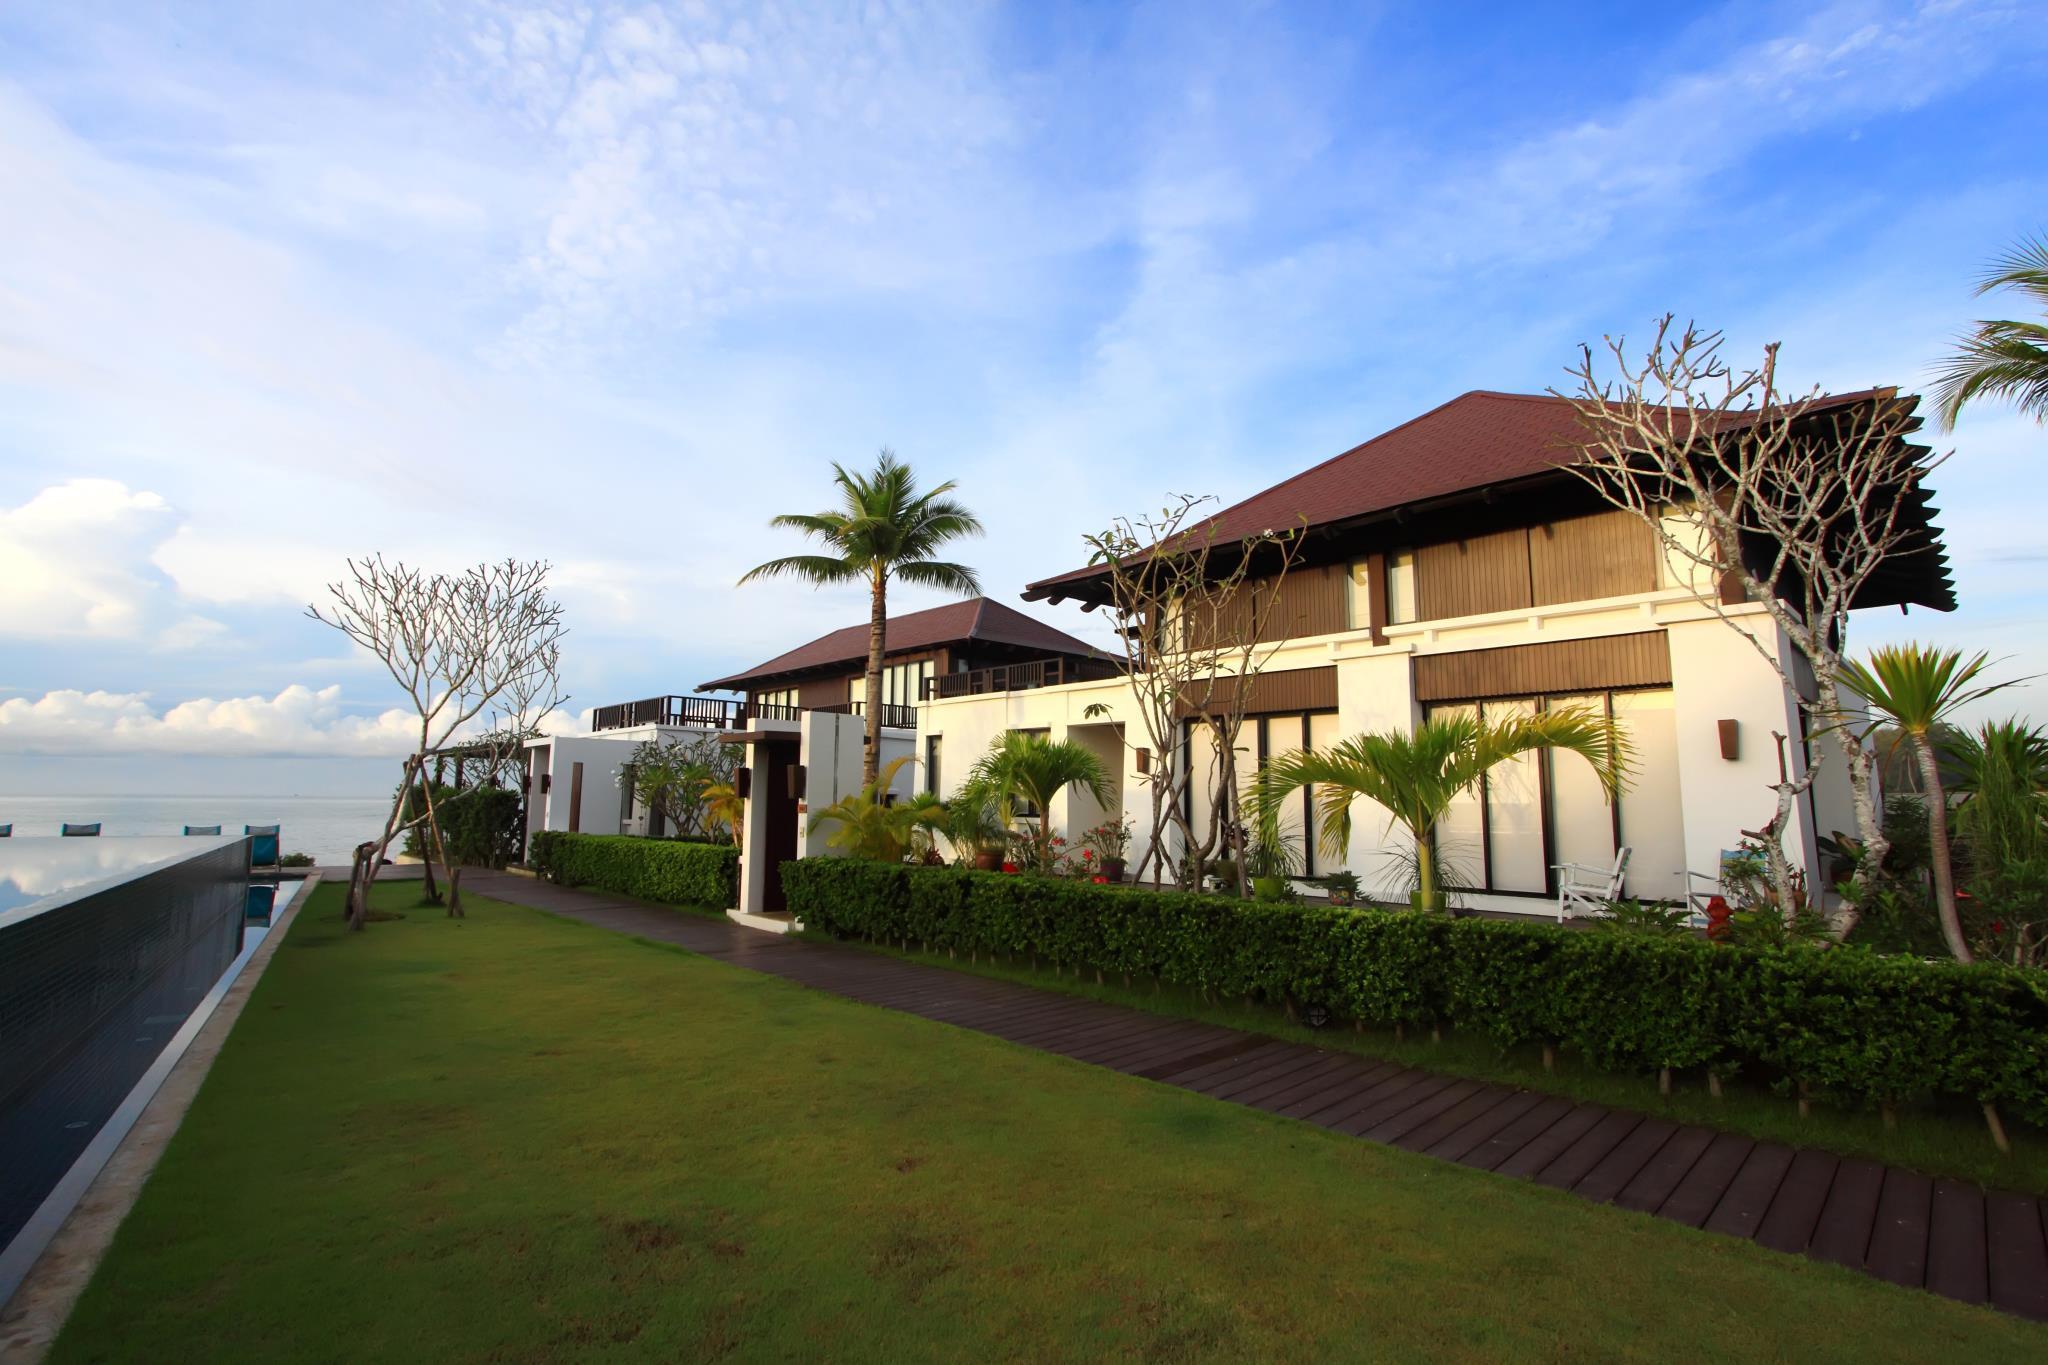 The Oriental Beach Resort,ดิ โอเรียนทอล บีช รีสอร์ท